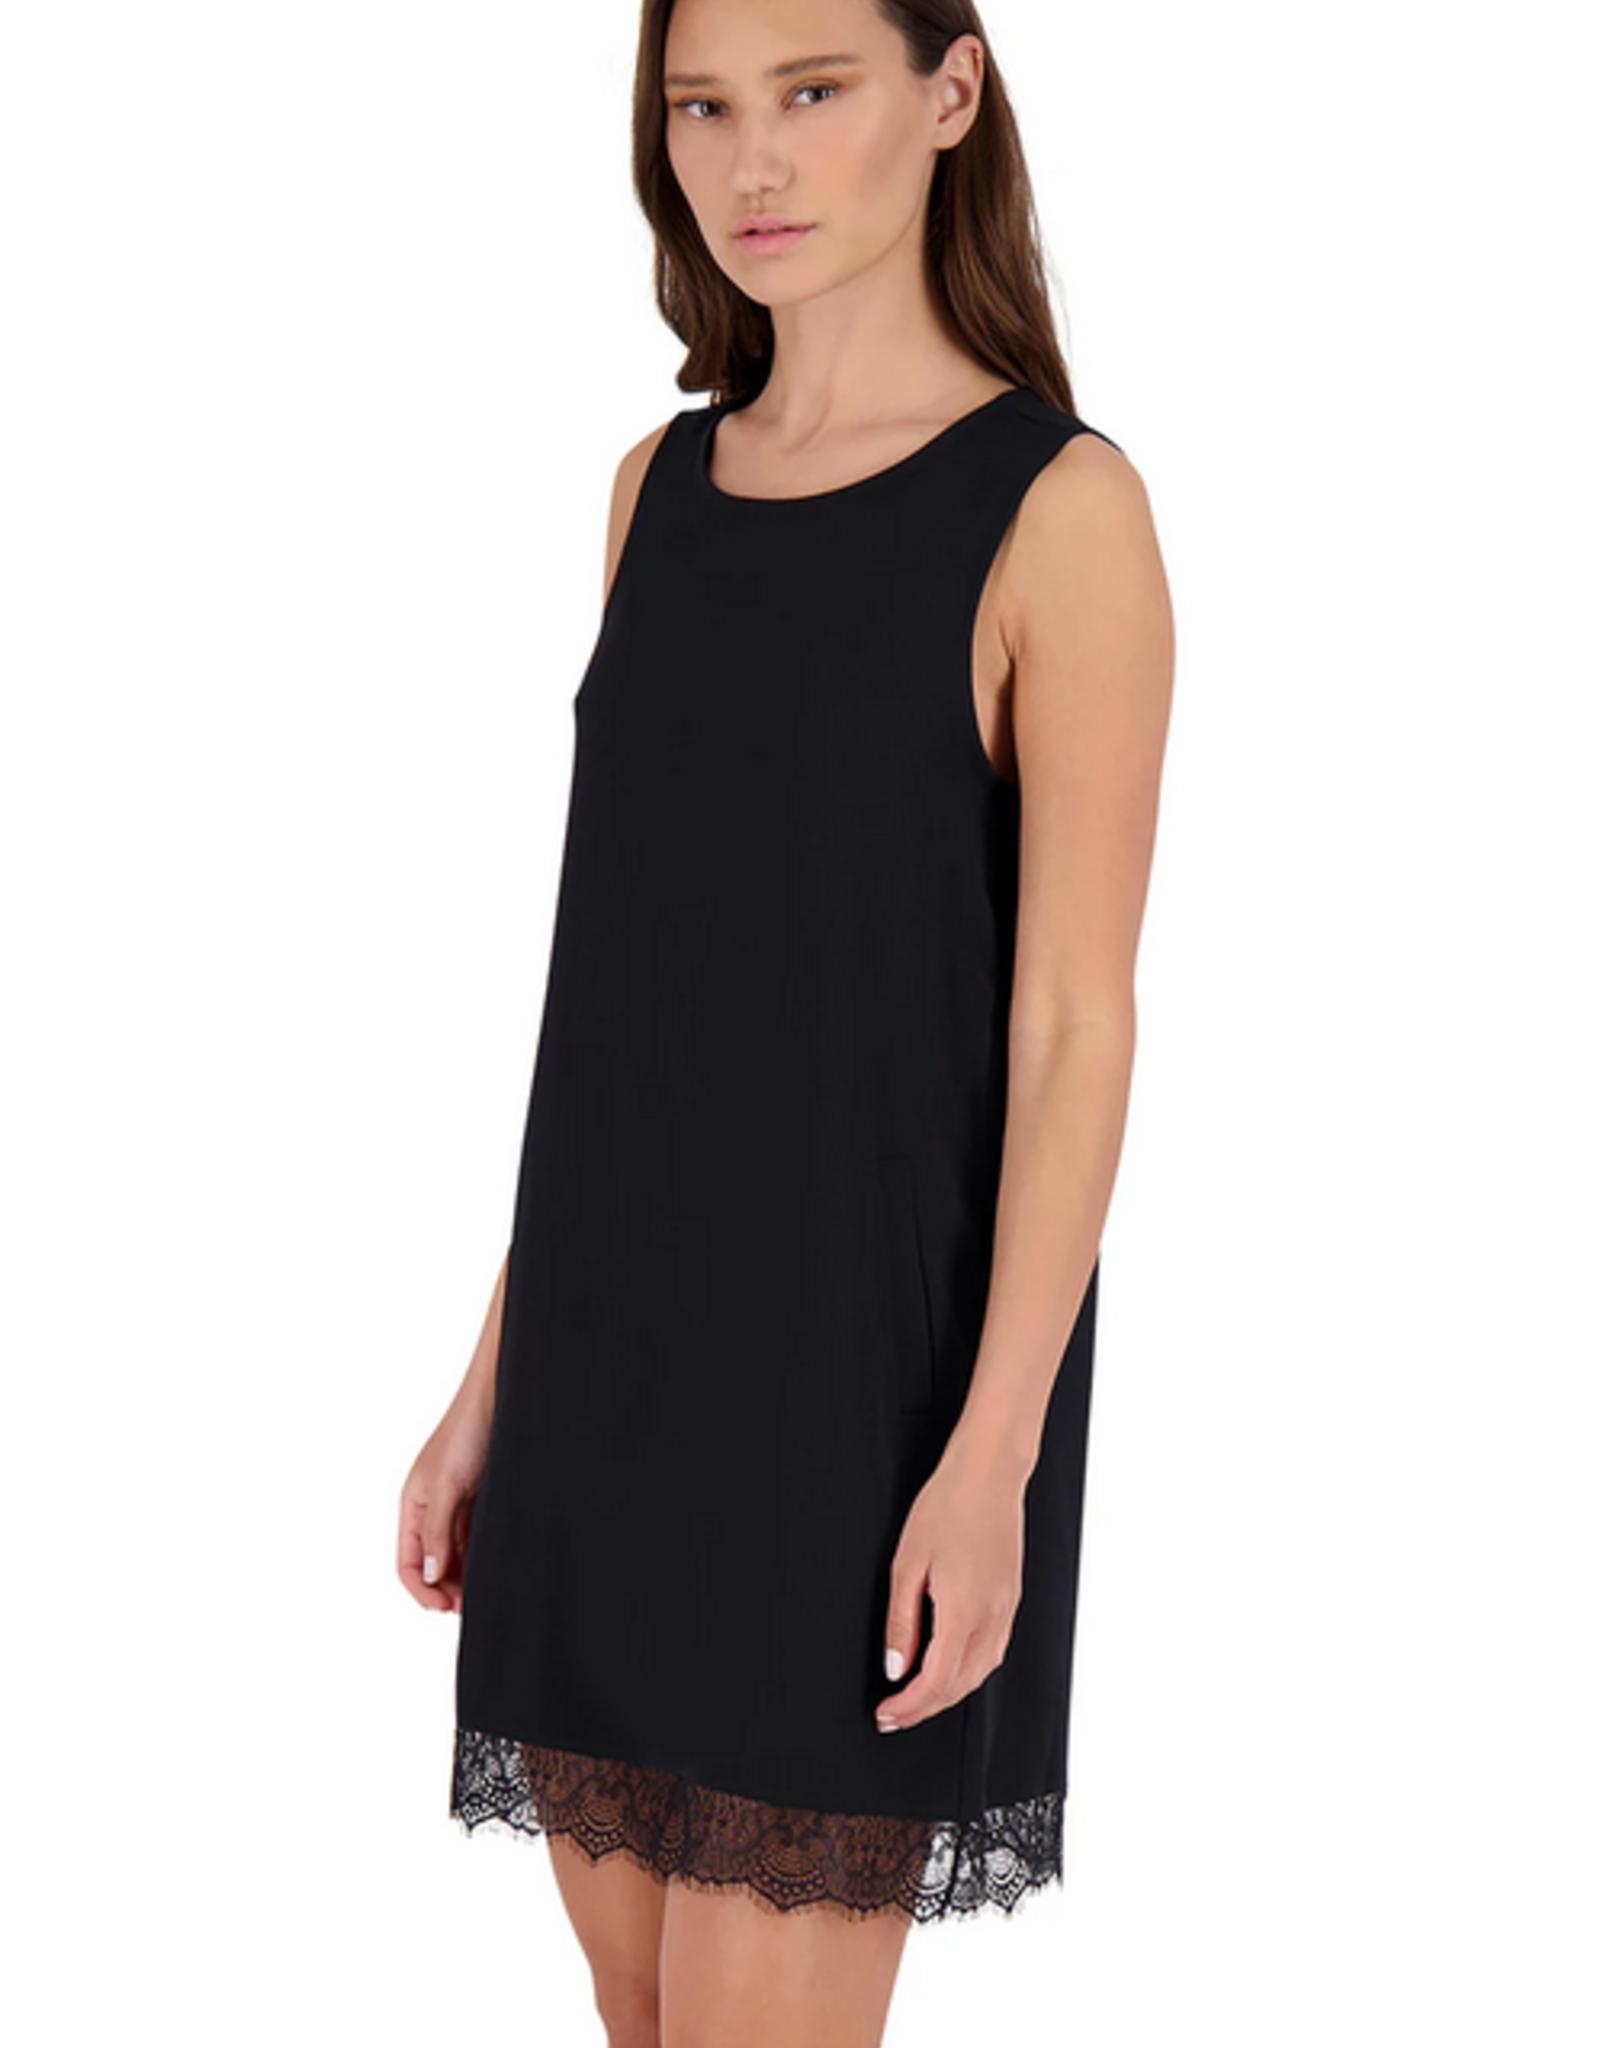 BB Dakota In Lace of Emergency Black Dress